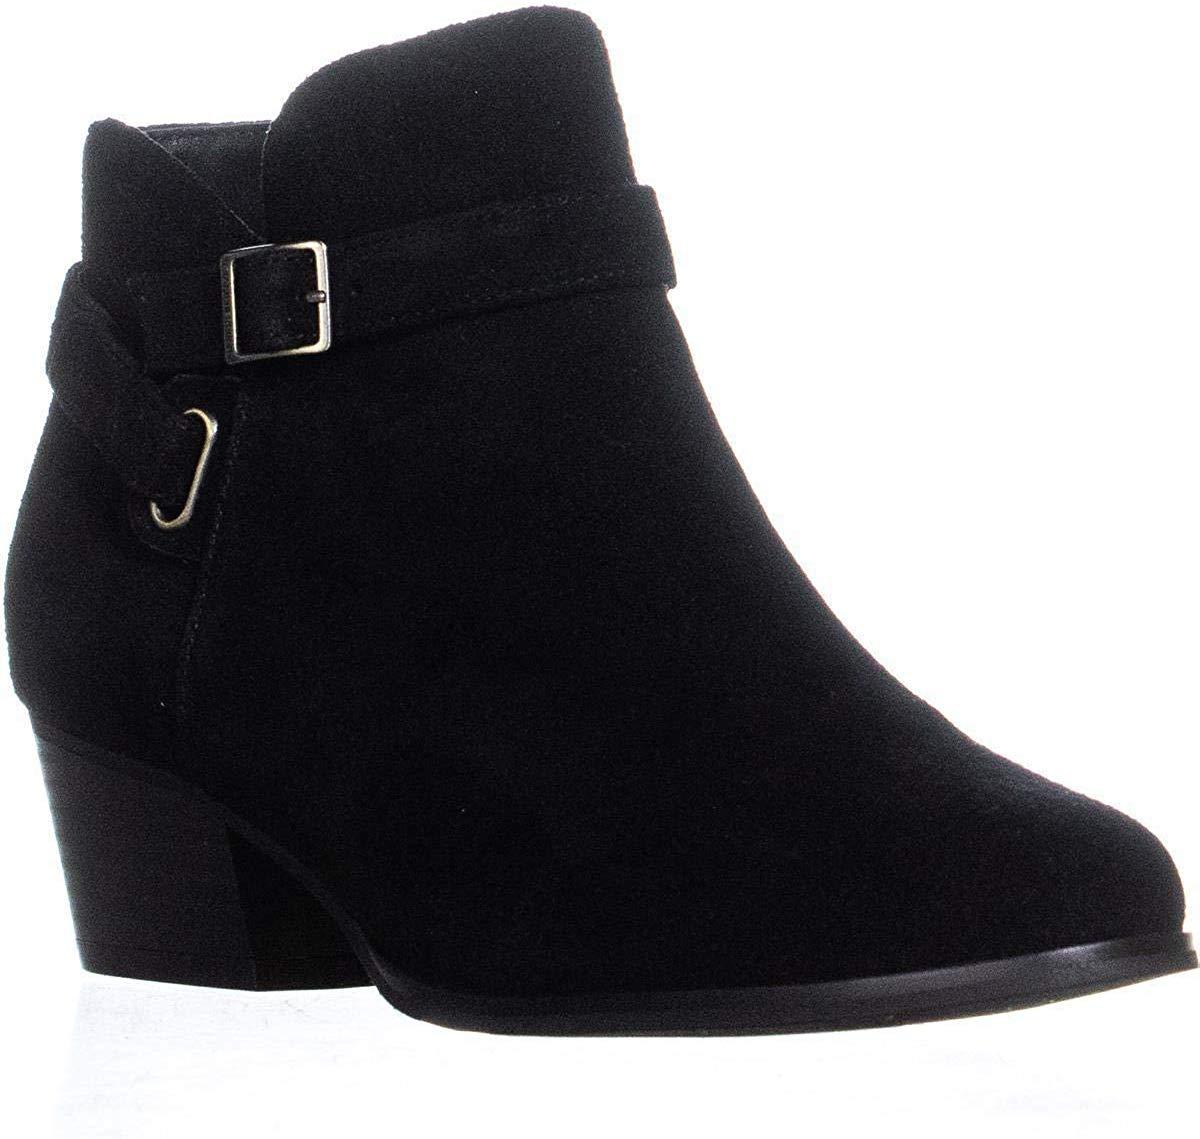 thumbnail 6 - Giani-Bernini-Womens-Dorii-Leather-Almond-Toe-Ankle-Fashion-Boots